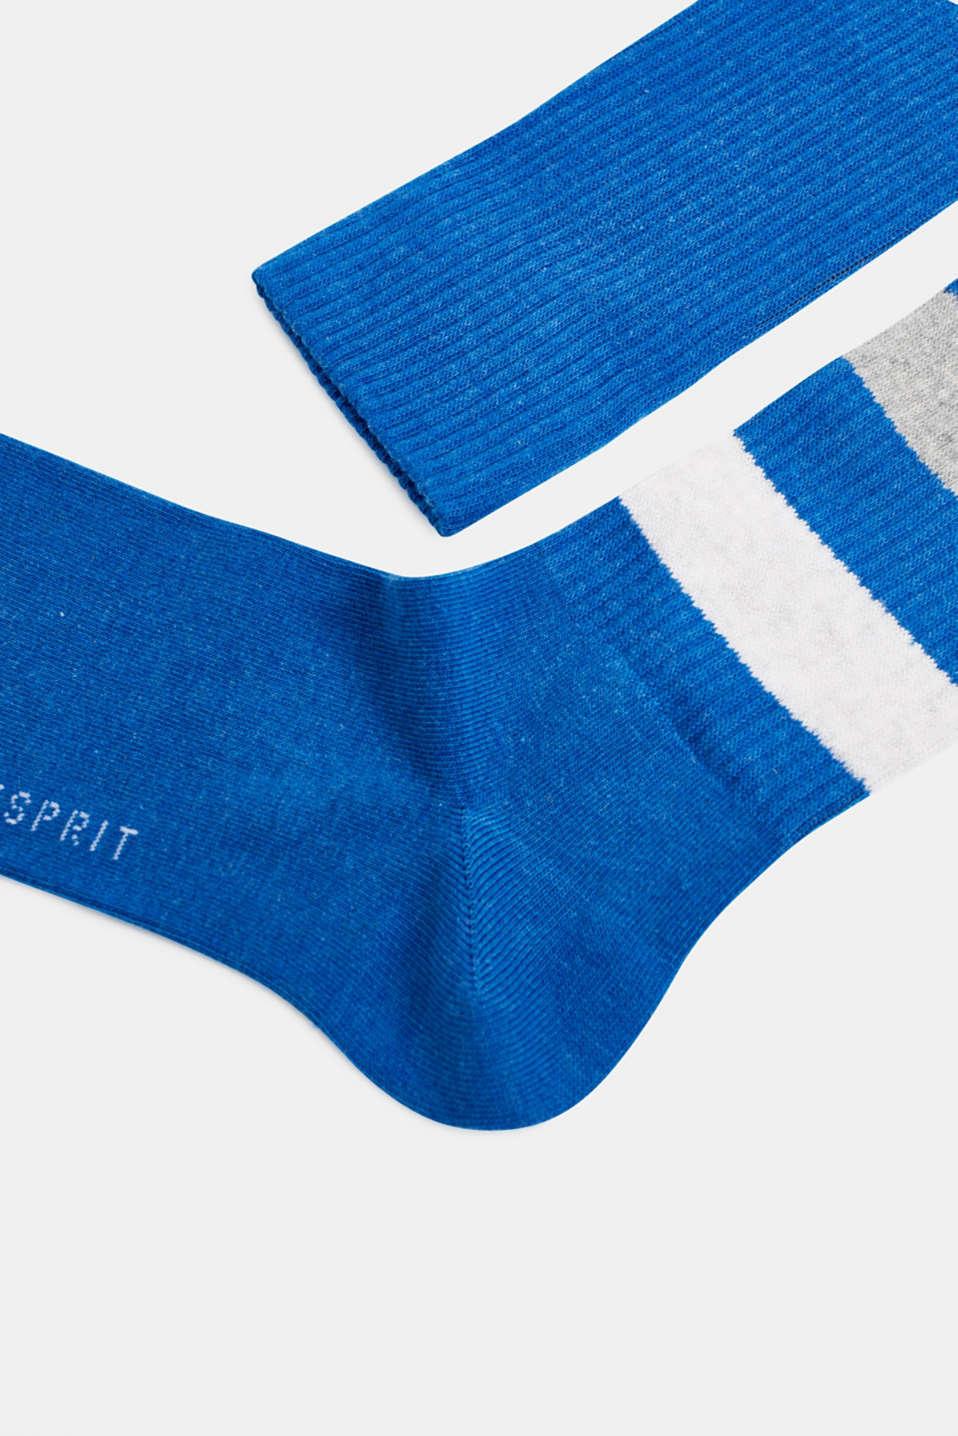 Double pack of blended cotton socks, CORNFLOWER BL, detail image number 1